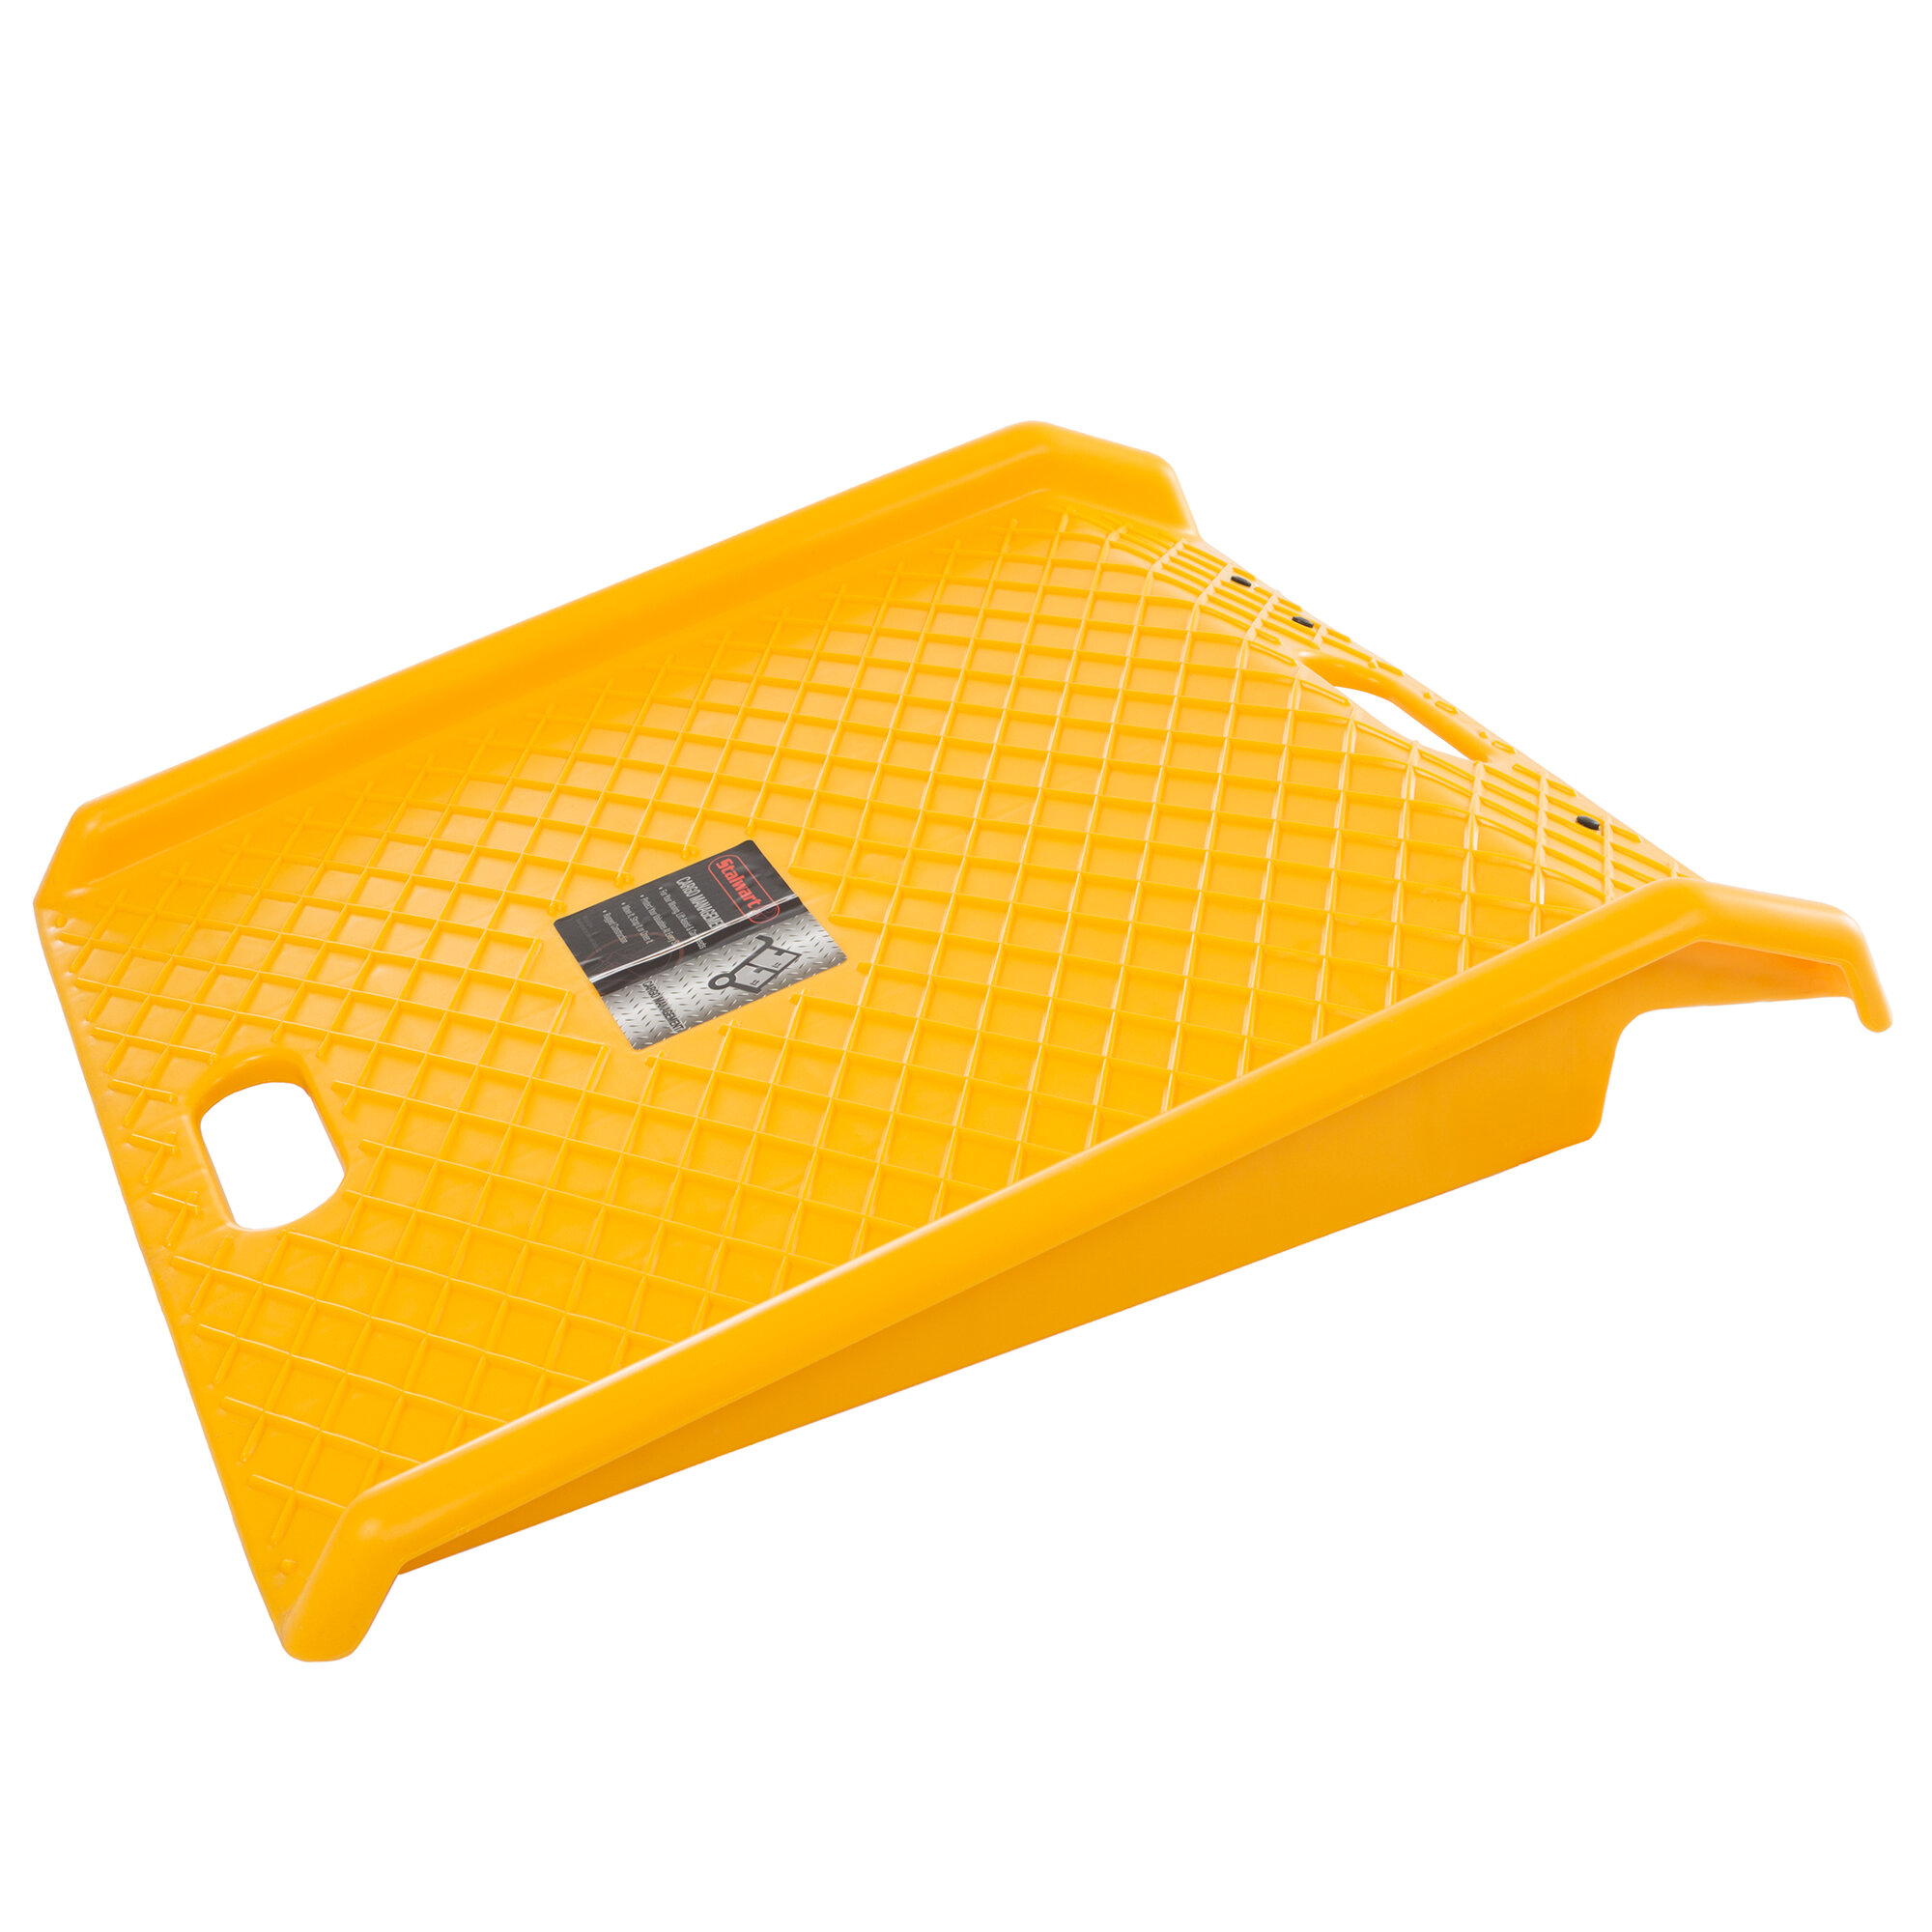 Stalwart Portable Curb Threshold Ramp | Wayfair